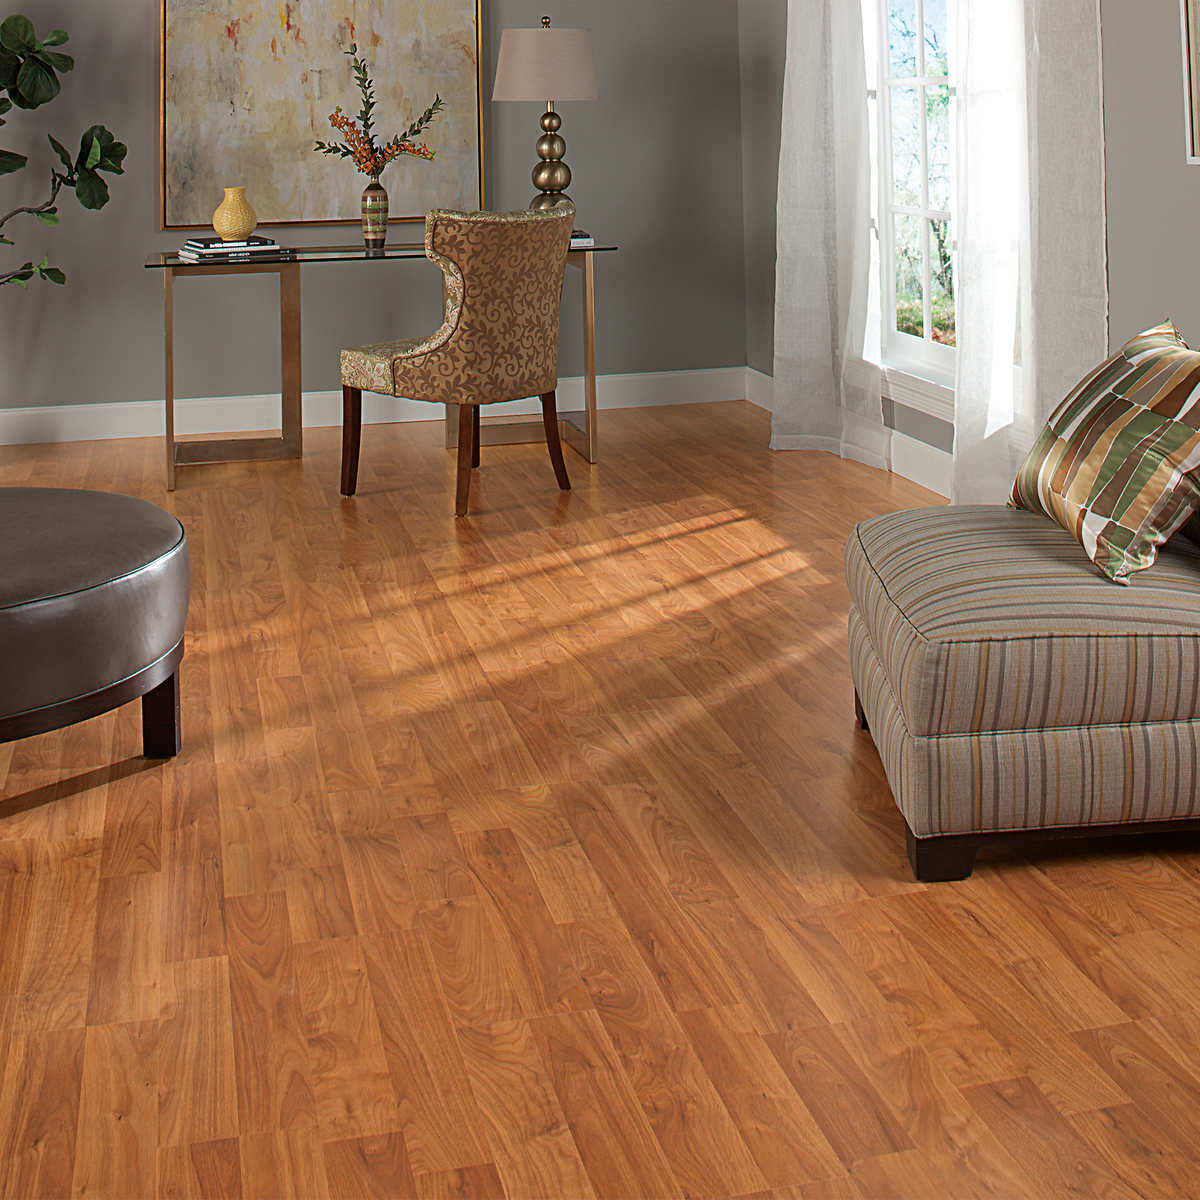 Out of Stock Harmonics Sunset Acacia Flooring 22.09 SQ FT Per Box - Laminate Flooring Costco